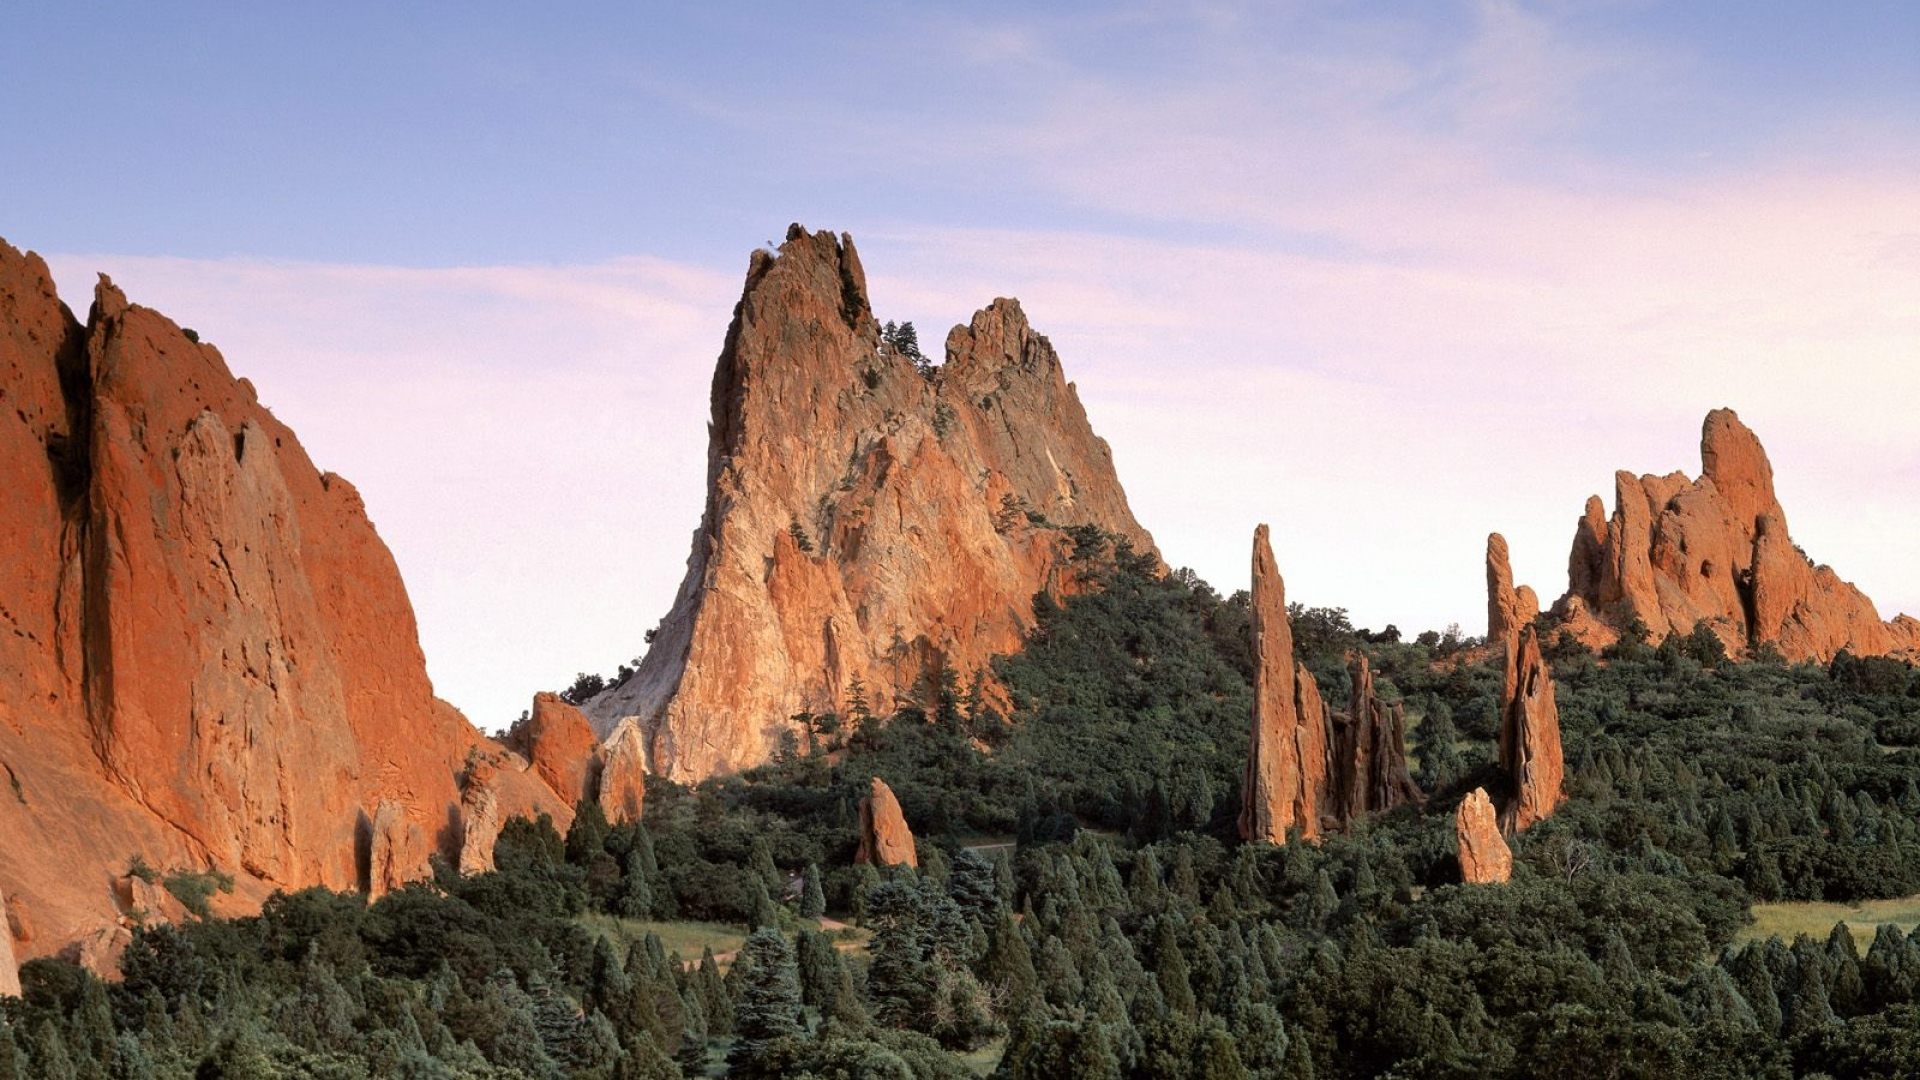 Colorado Wood Rocks Stones Wallpaper Background Full HD 1080p 1920x1080